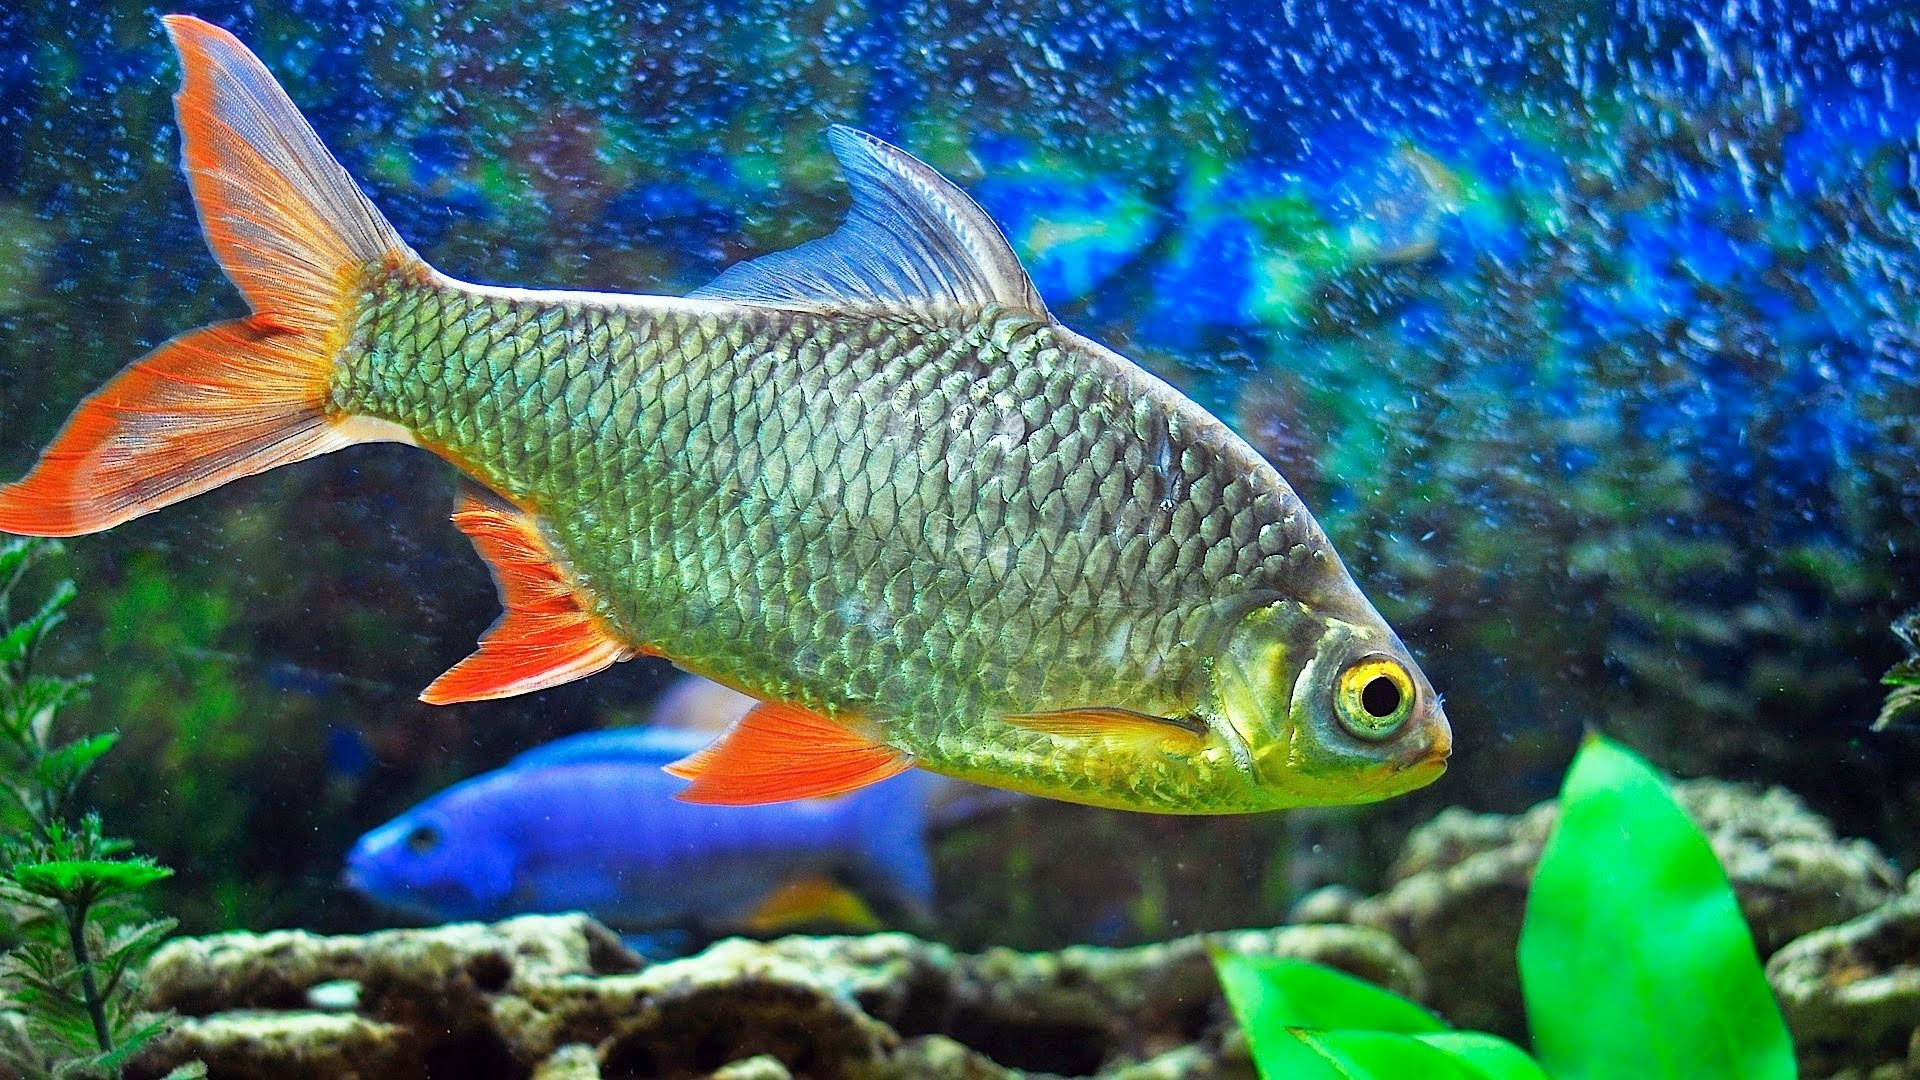 Fish wallpaper and screensavers 58 images for Amazon aquarium fish